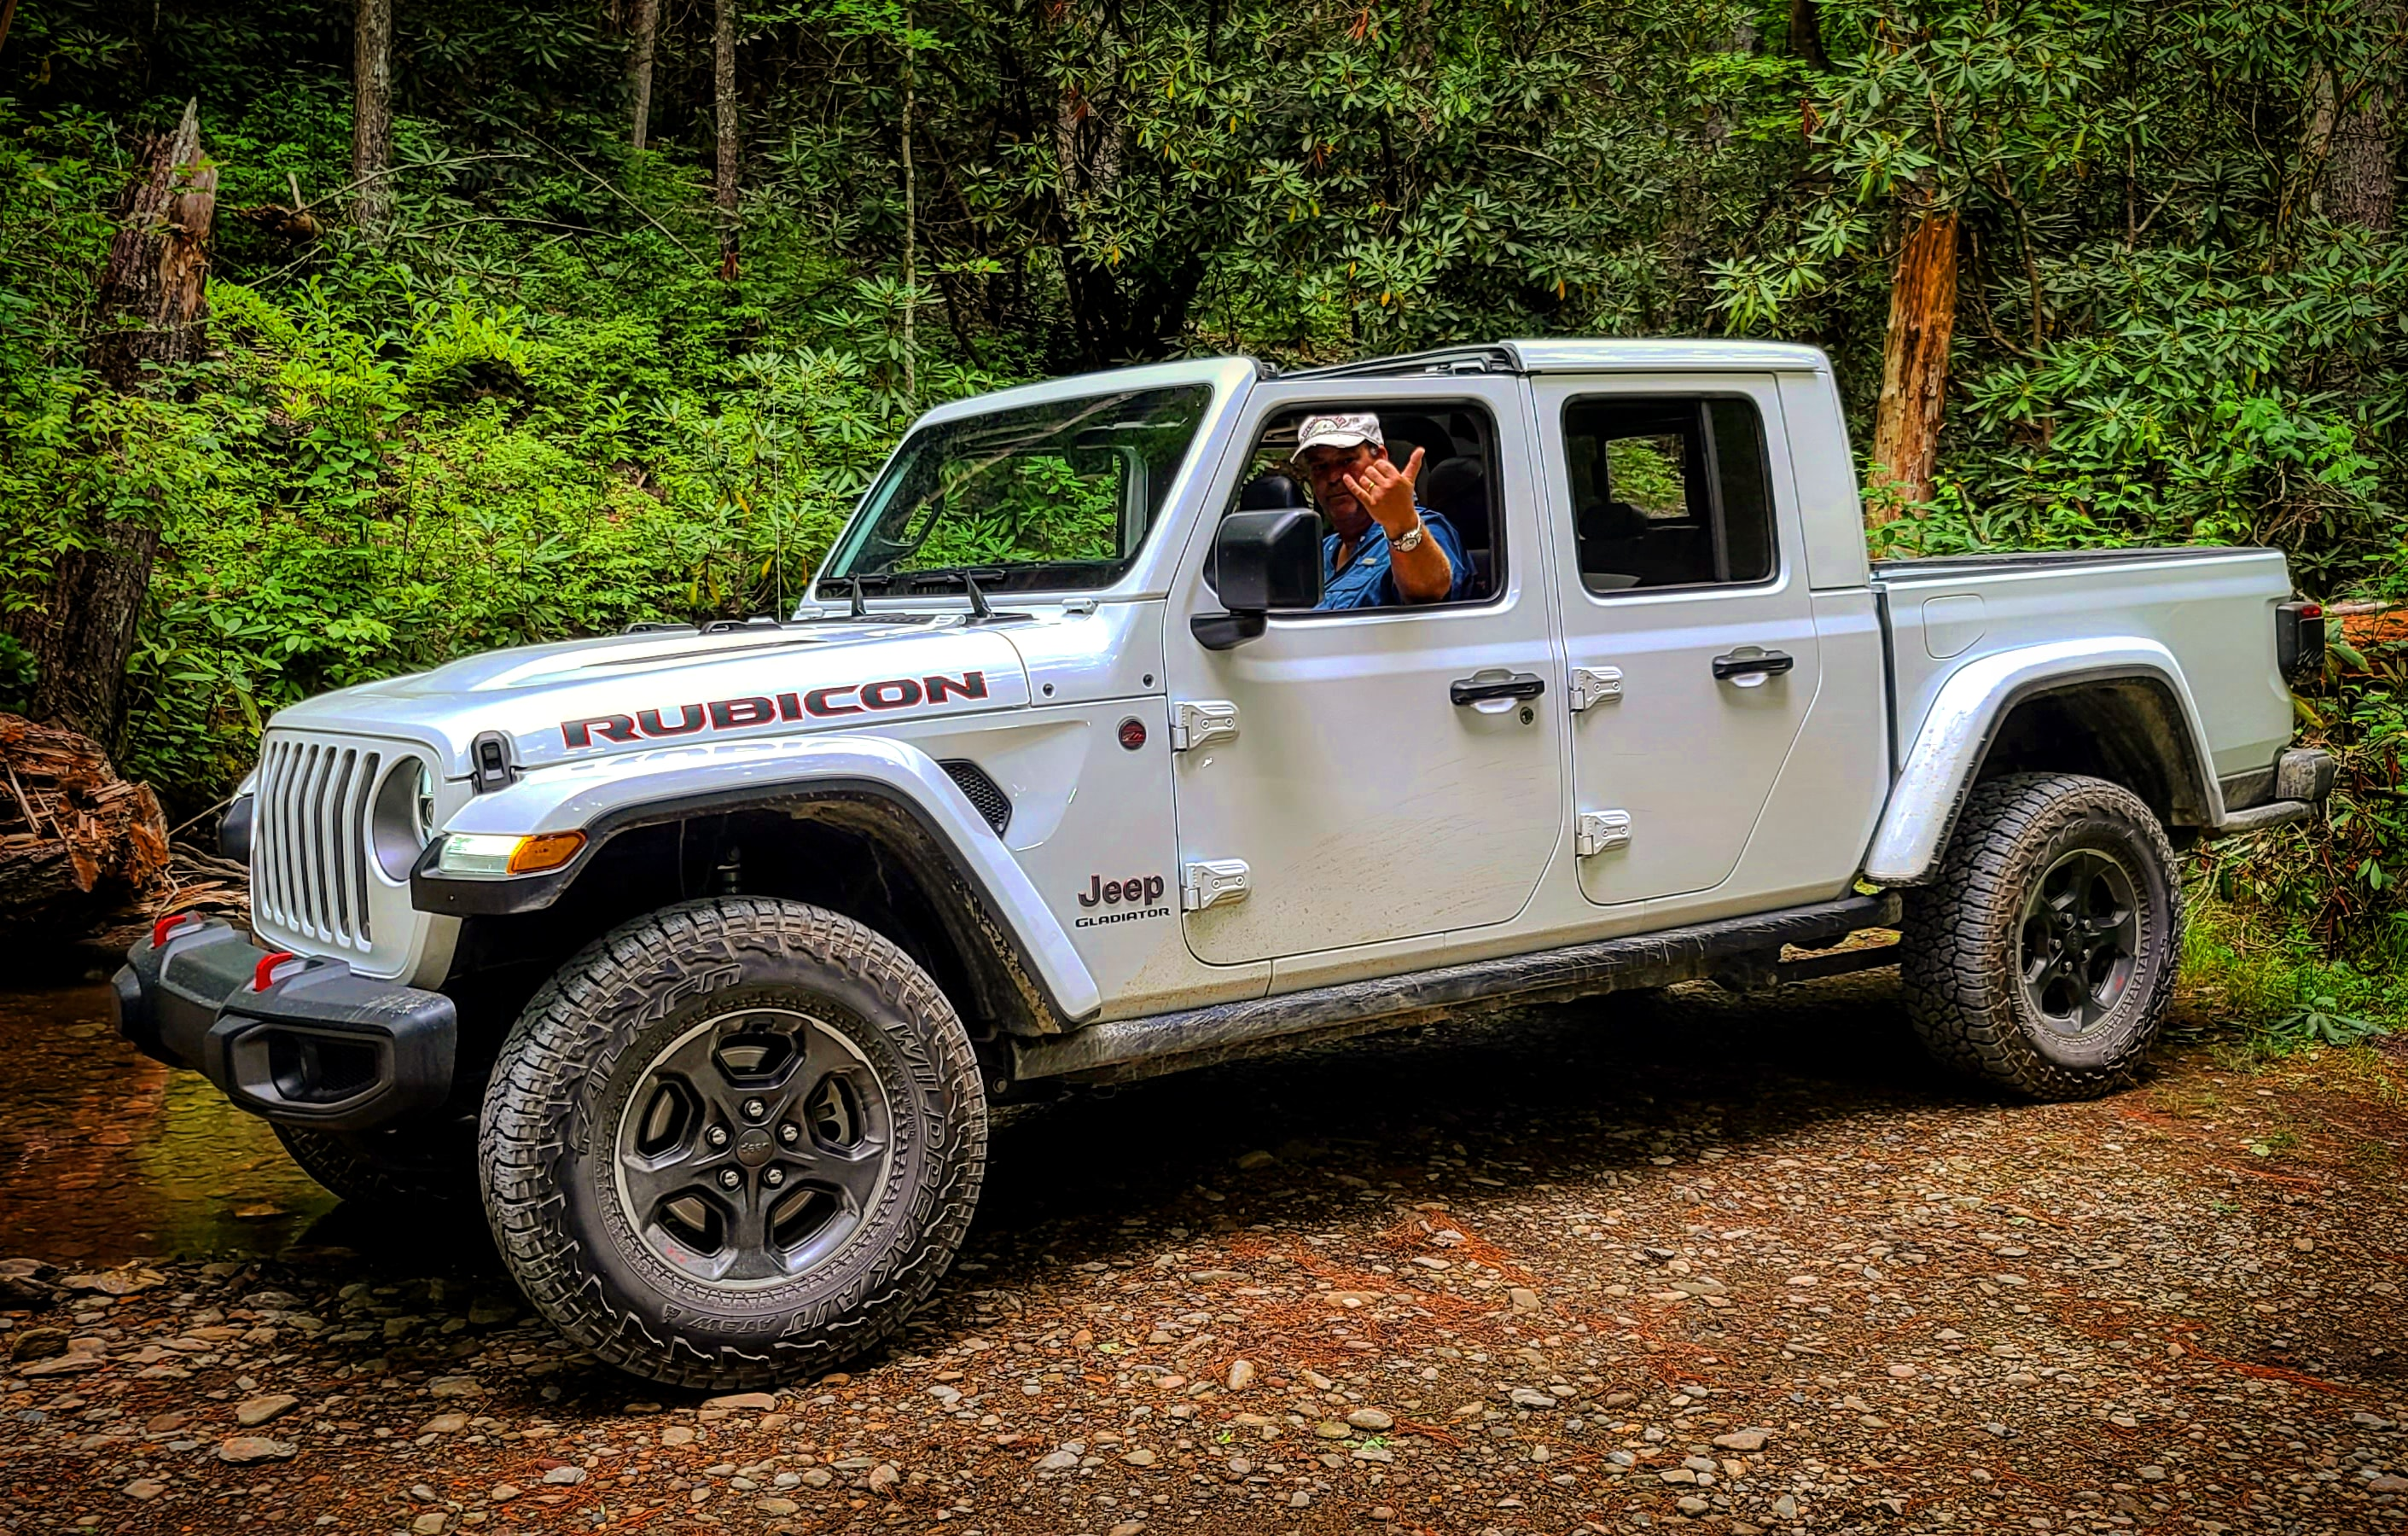 Smoky Mountain Adventure Rentals 4